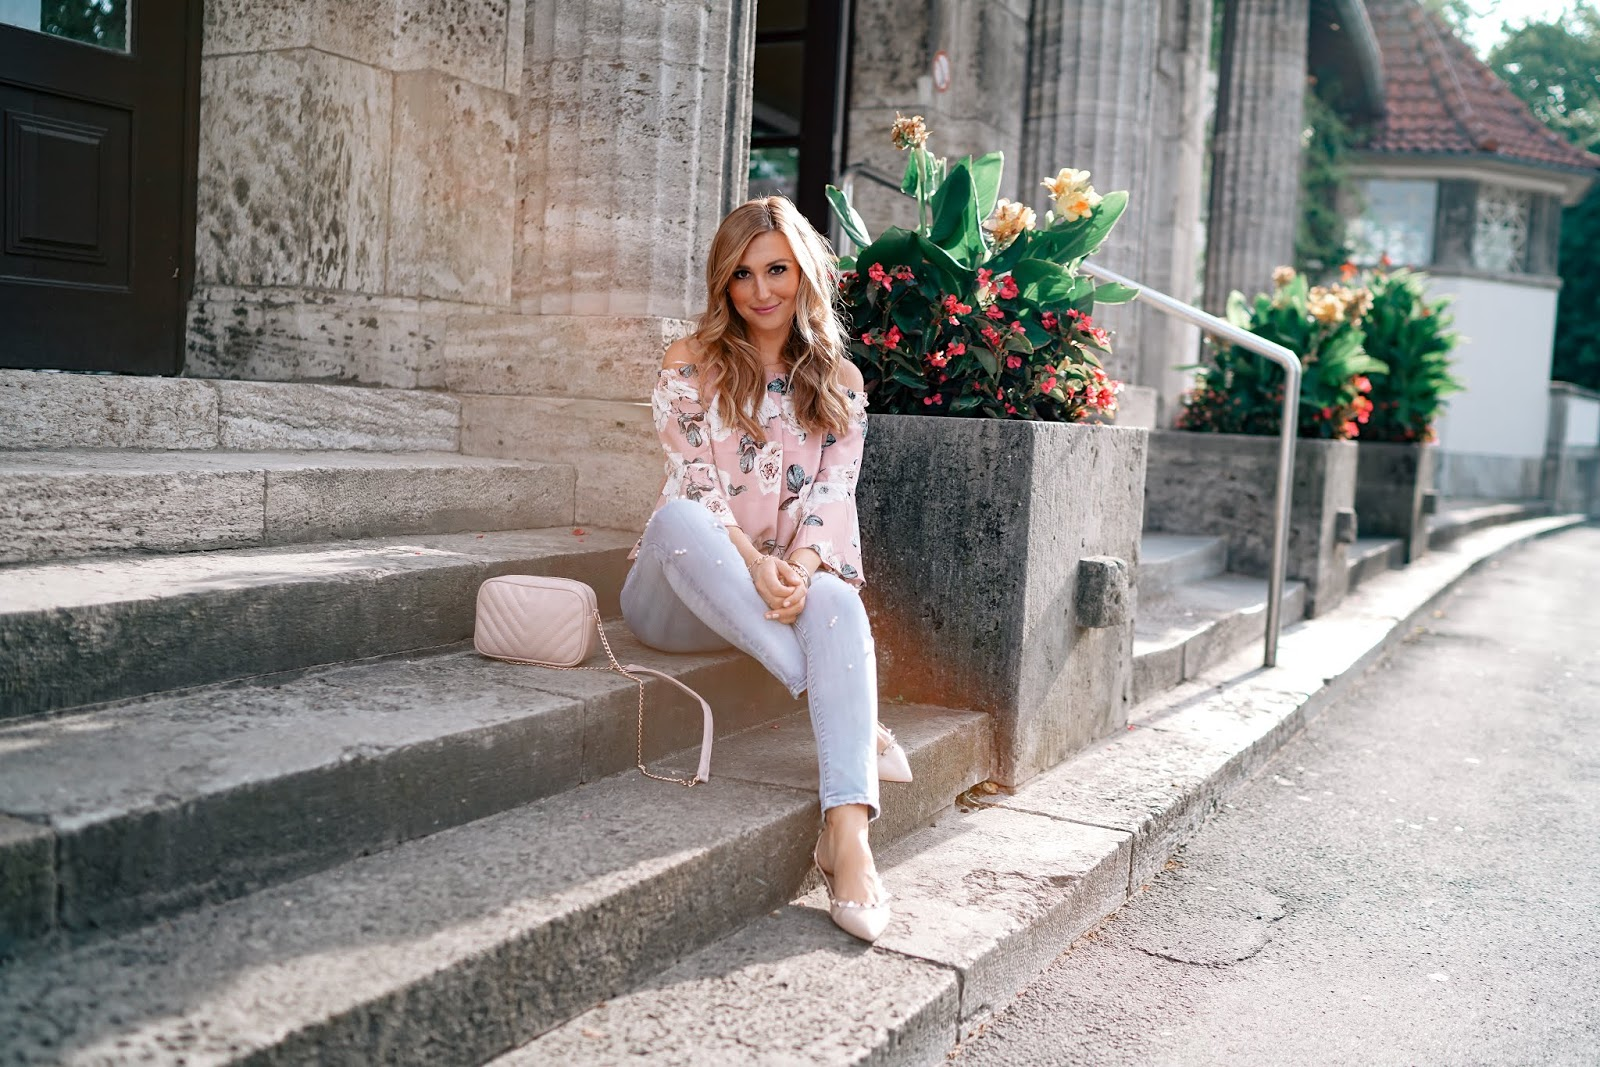 cold-shoulder-top-puderrosa-Offshoulder-jeans-mit-perlen-perlen Jeanshose-bloggerstyle-herbst-Outfit-jeanshose-helle-jeans-hose-Fashionblogger-fashionstylebyjohanna